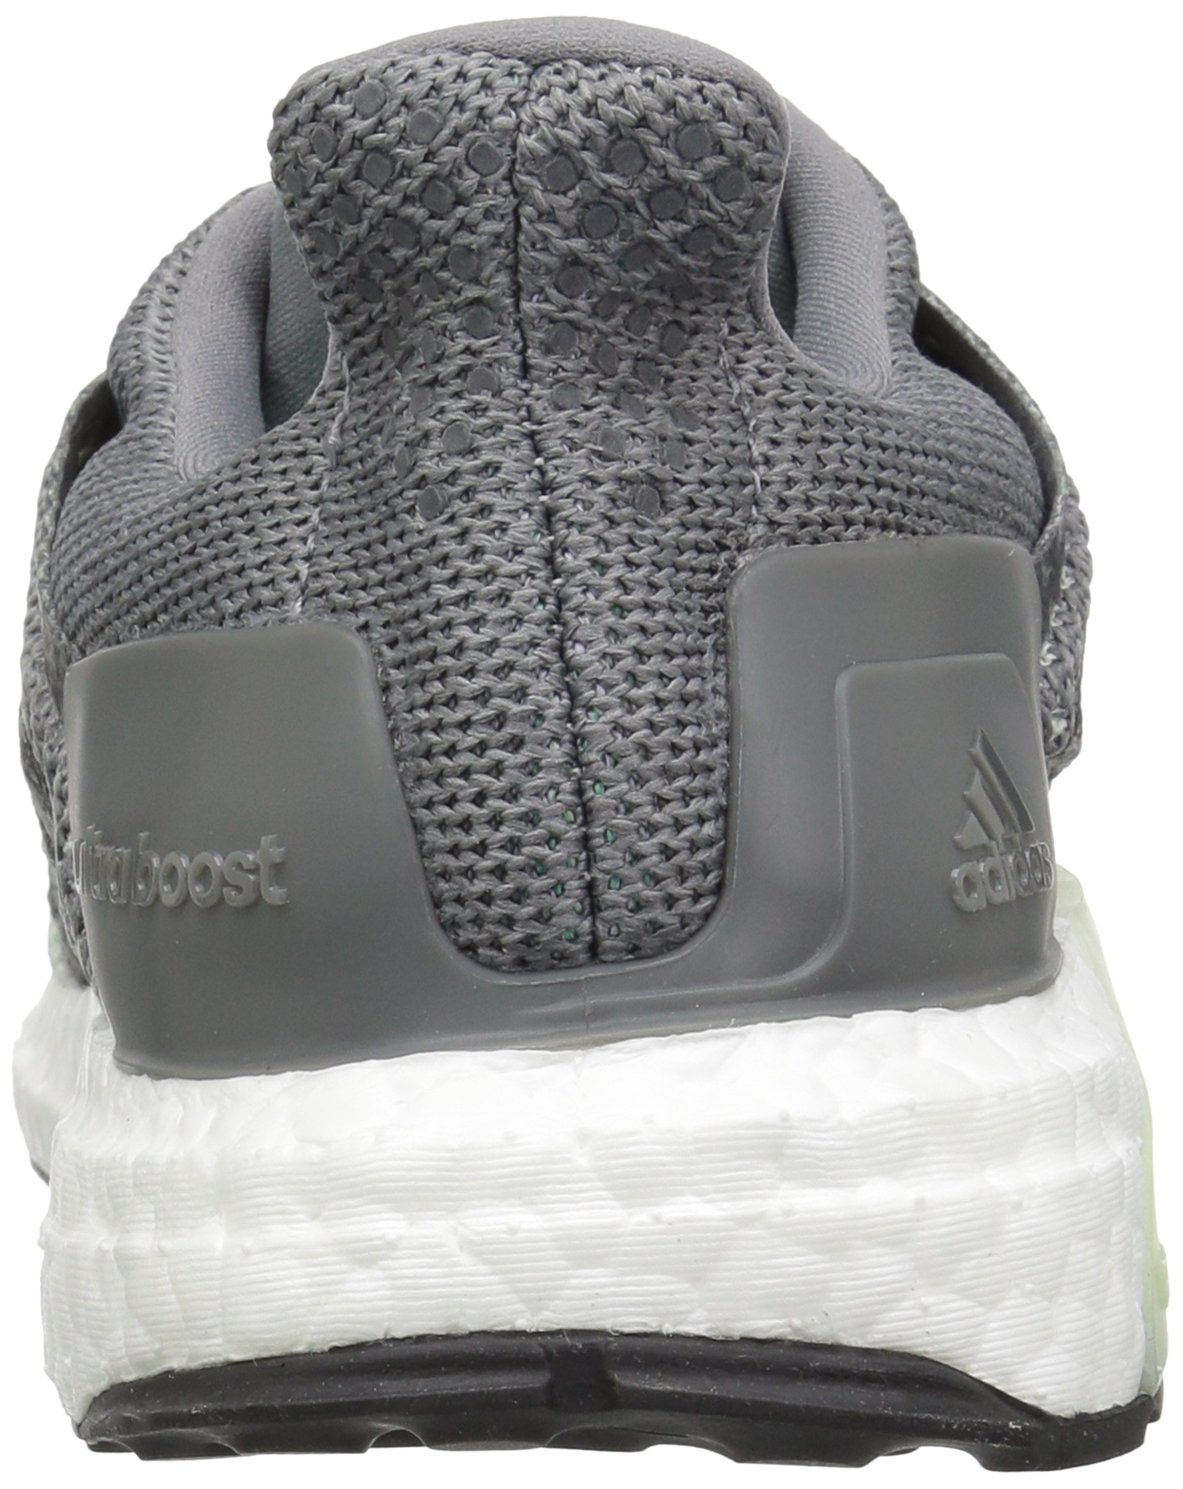 adidas Originals Women's Ultraboost St B0798VXP56 7.5 B(M) US|Crayon White/Black/Aero Green